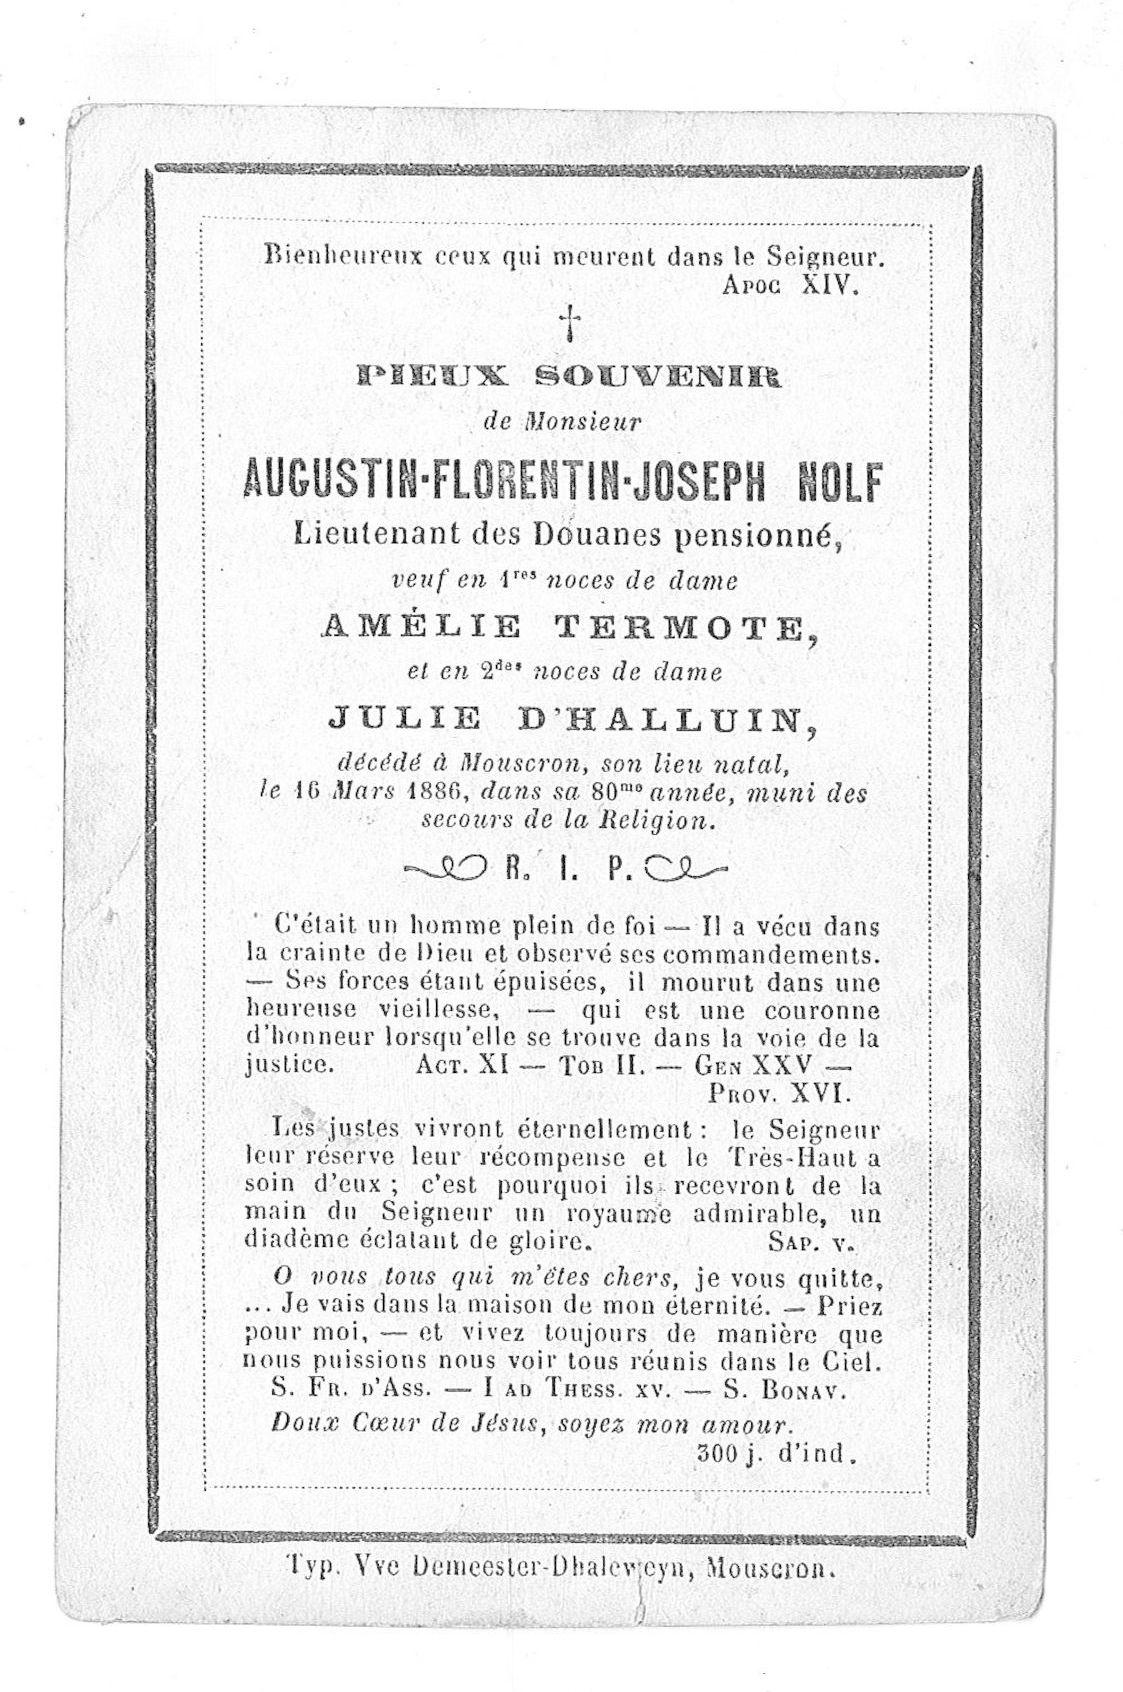 Augustin-Florentin-Joseph Nolf